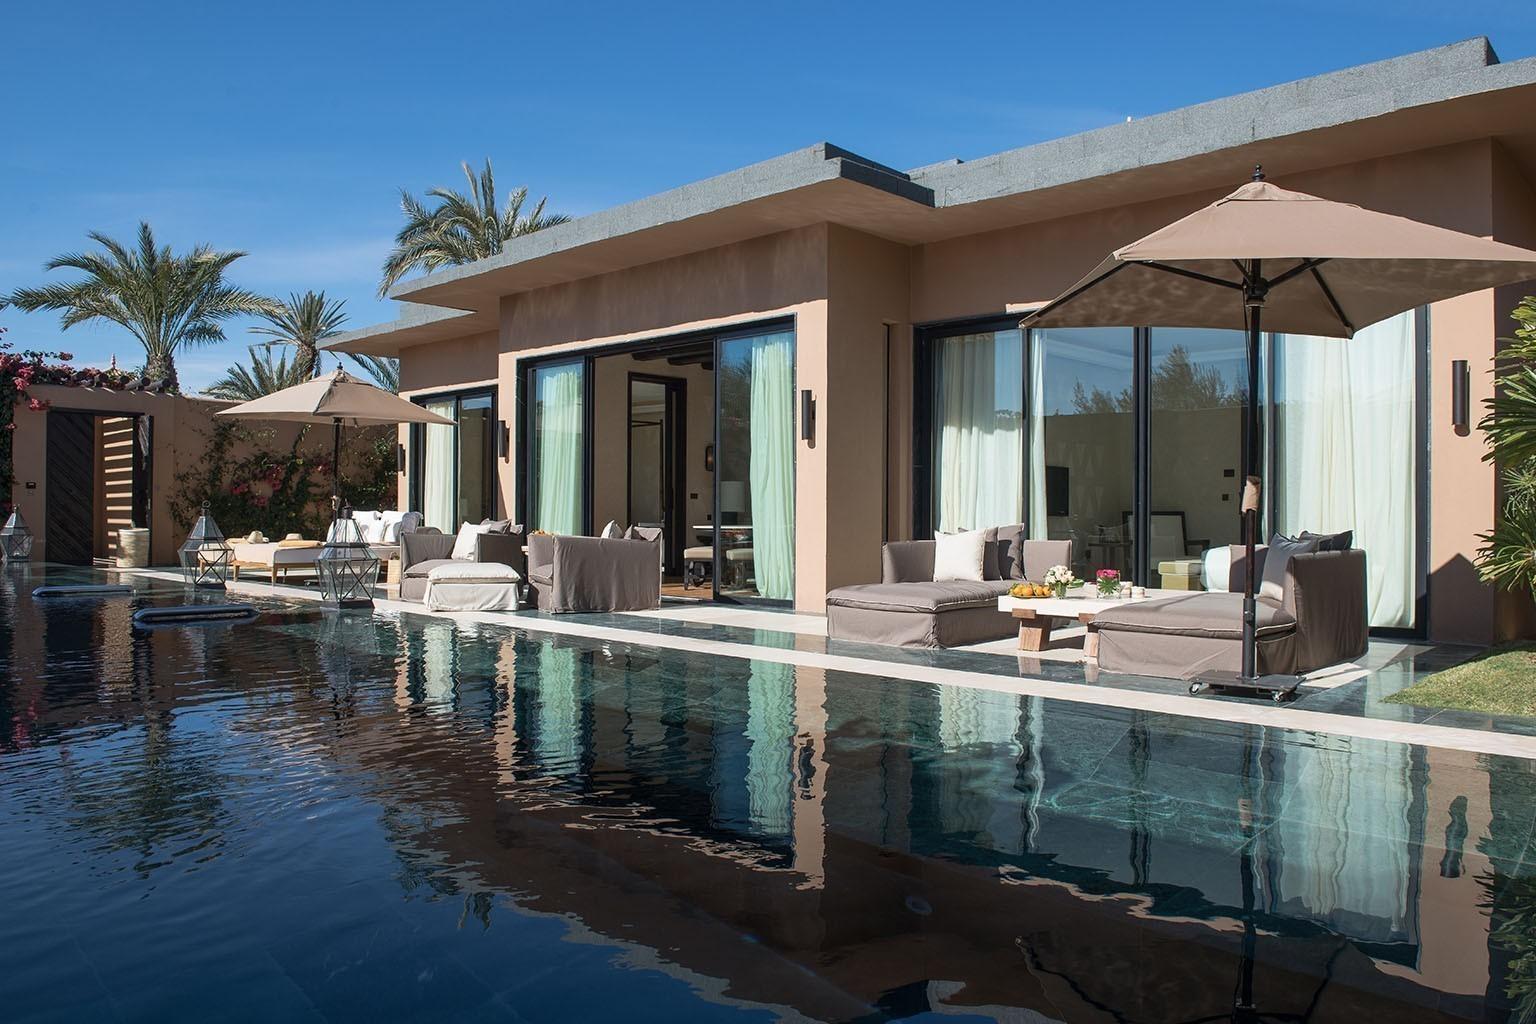 mandarin oriental marrakech luxushotel designreisen. Black Bedroom Furniture Sets. Home Design Ideas